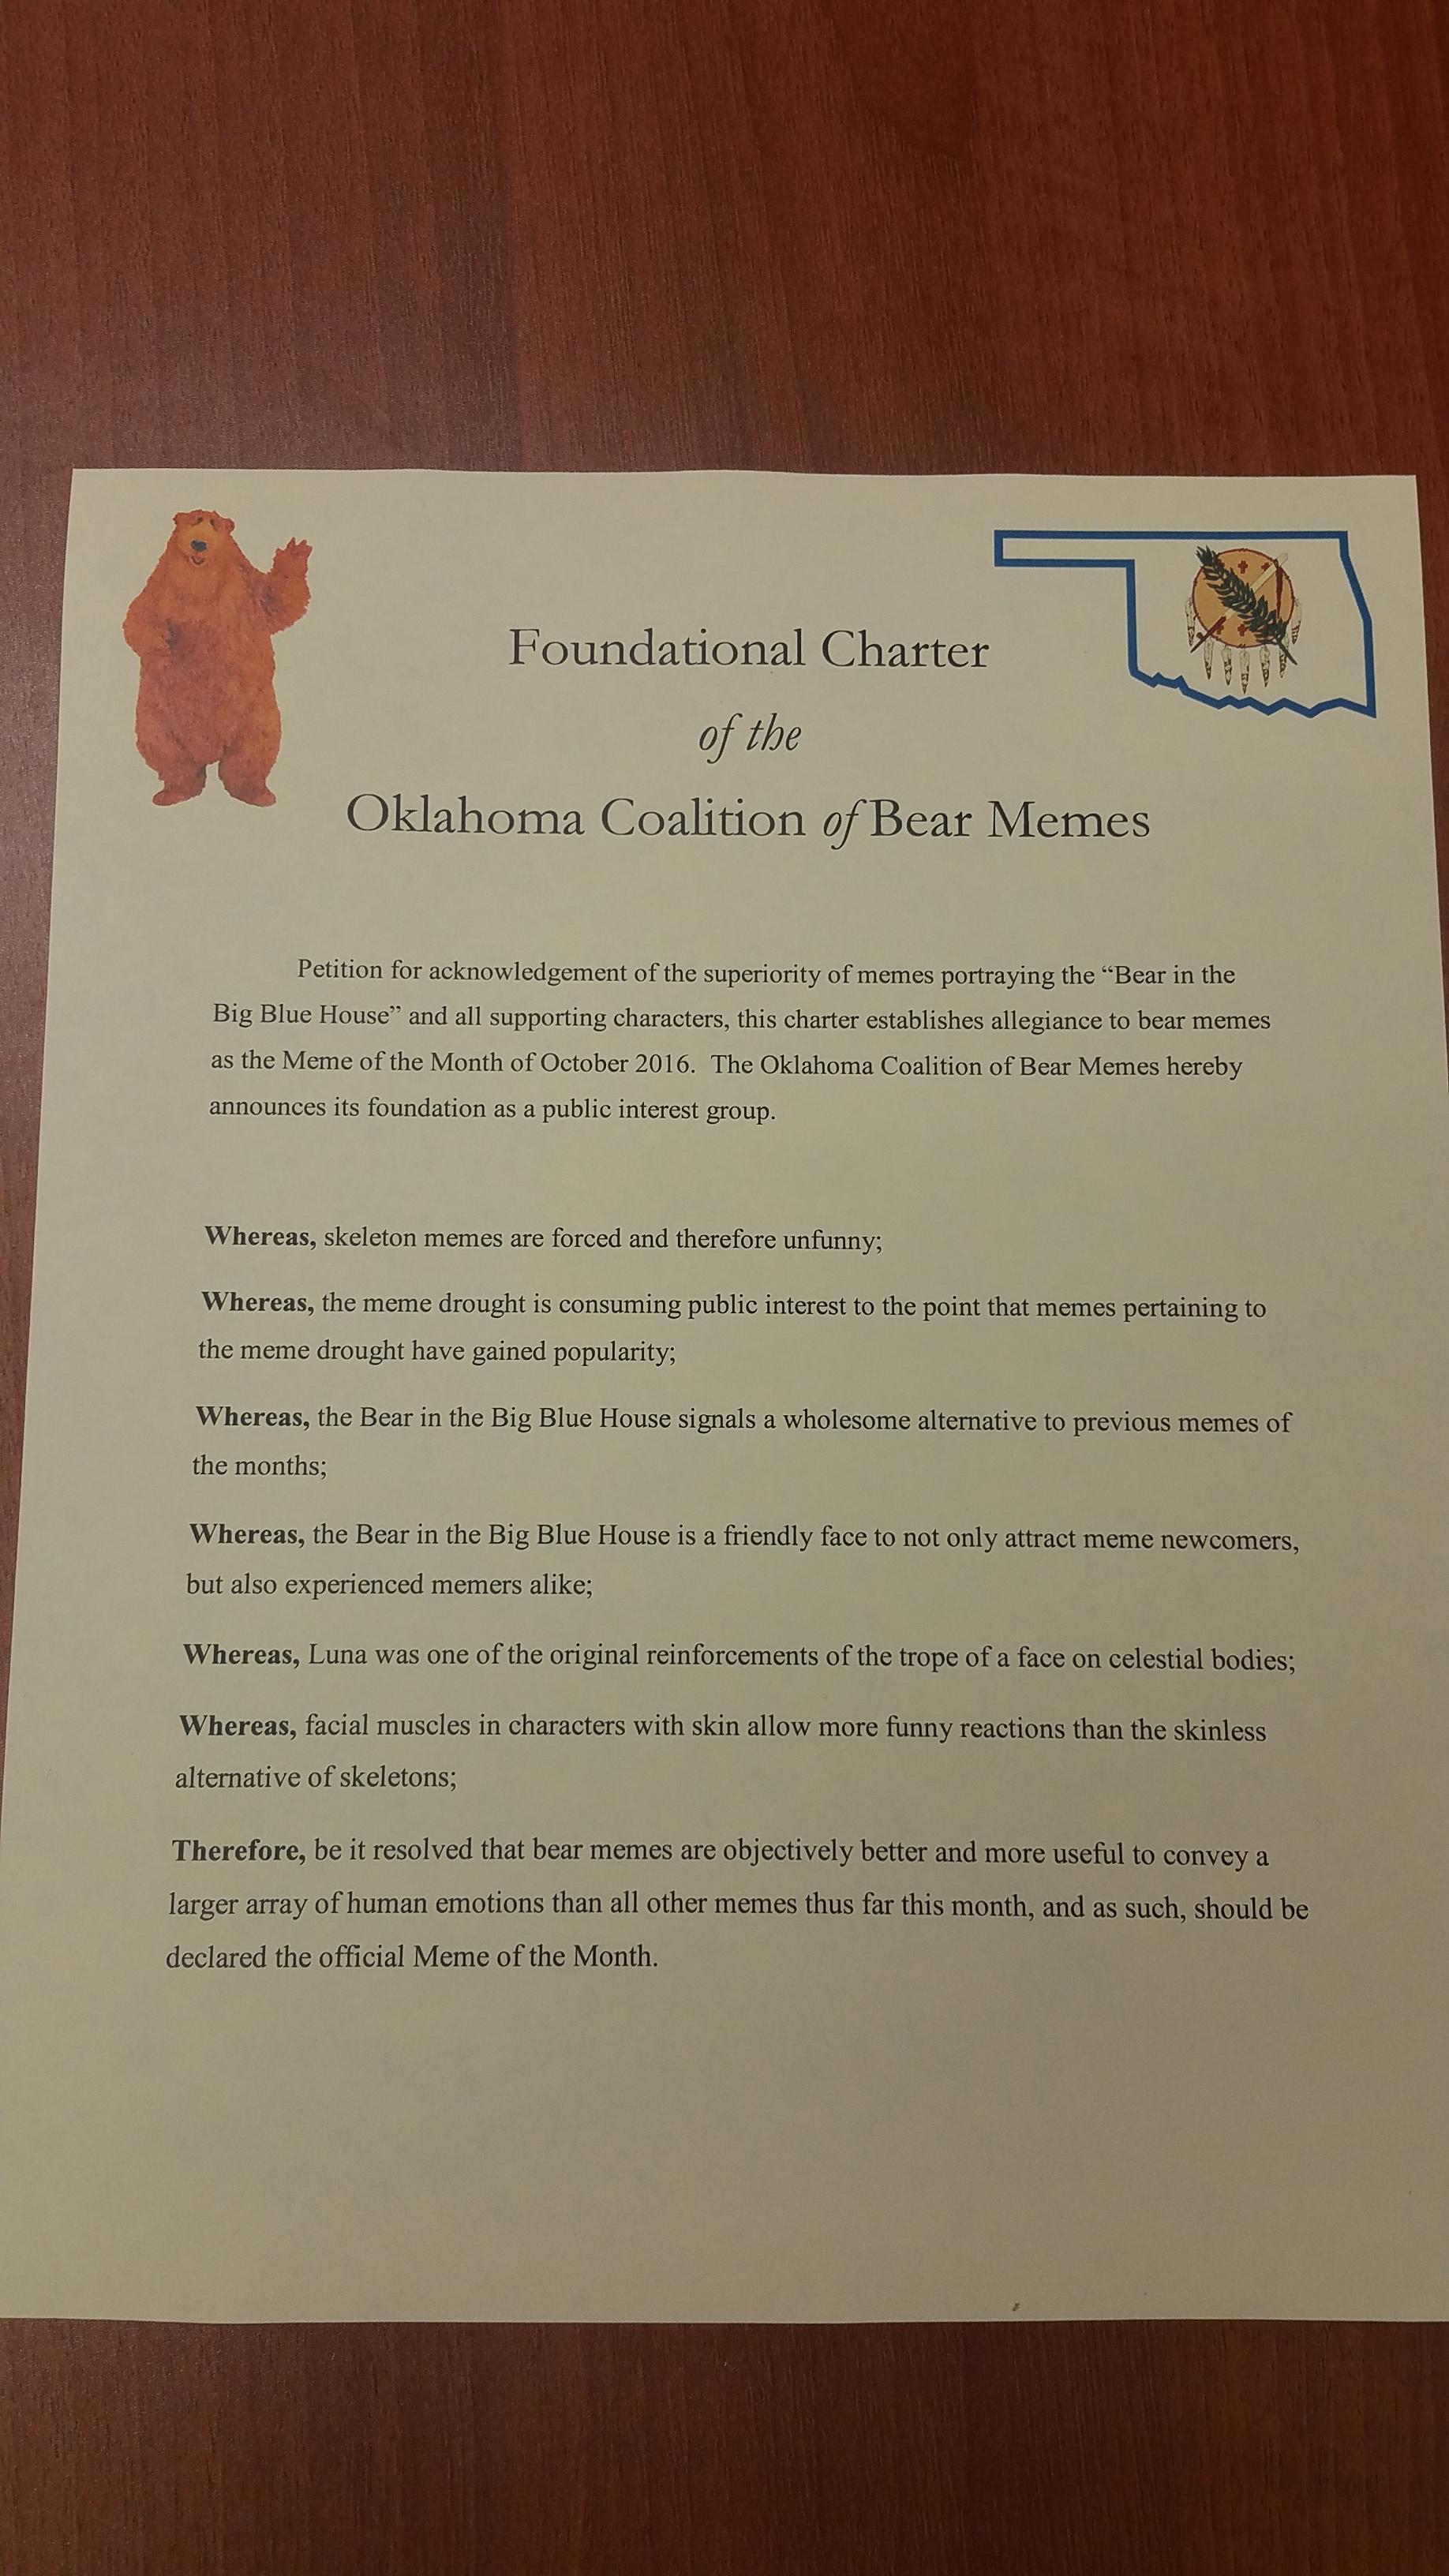 foundational charter of the oklahoma coalition of bear memes